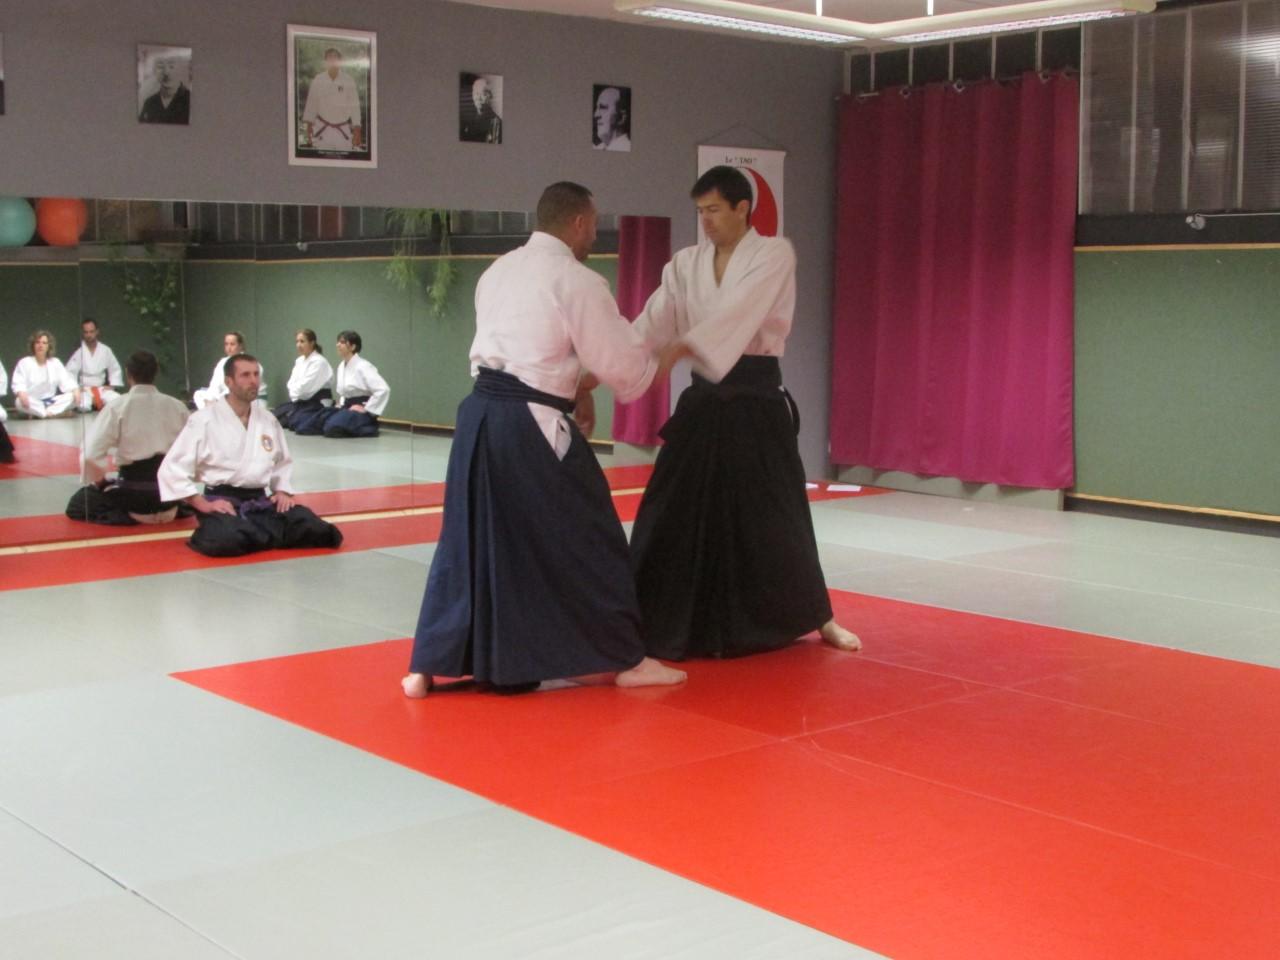 Kagami -Biraki Wa-Jutsu Agenais, 1er kata, 21 décembre 2017